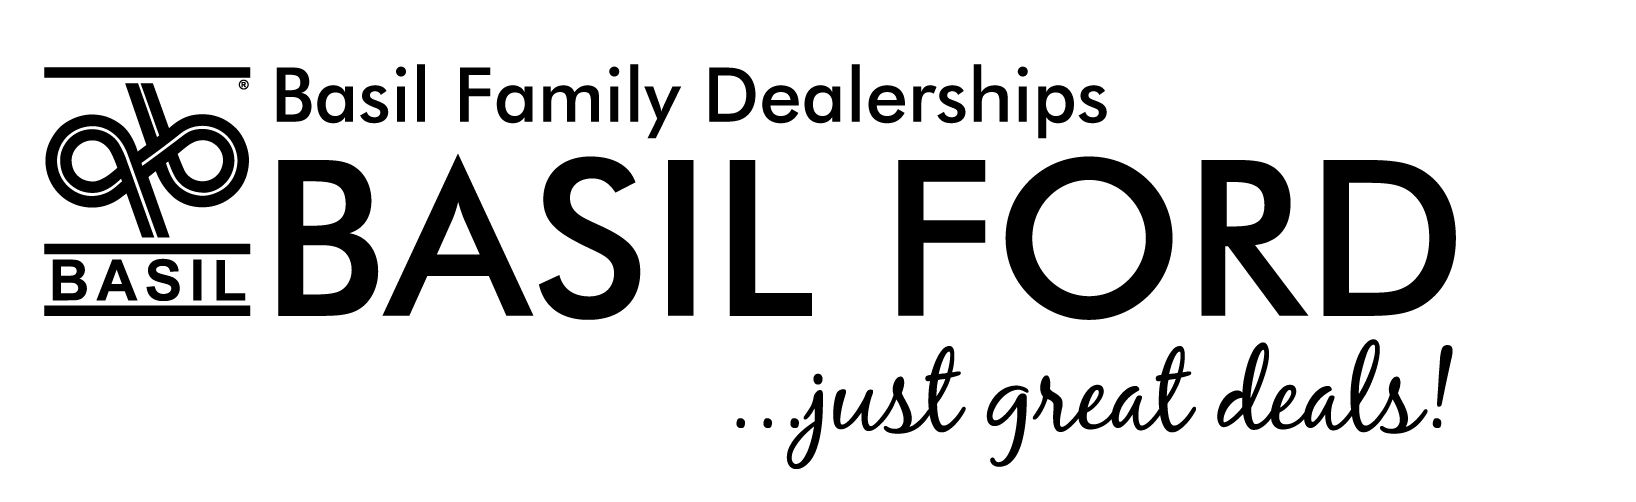 cbf-black